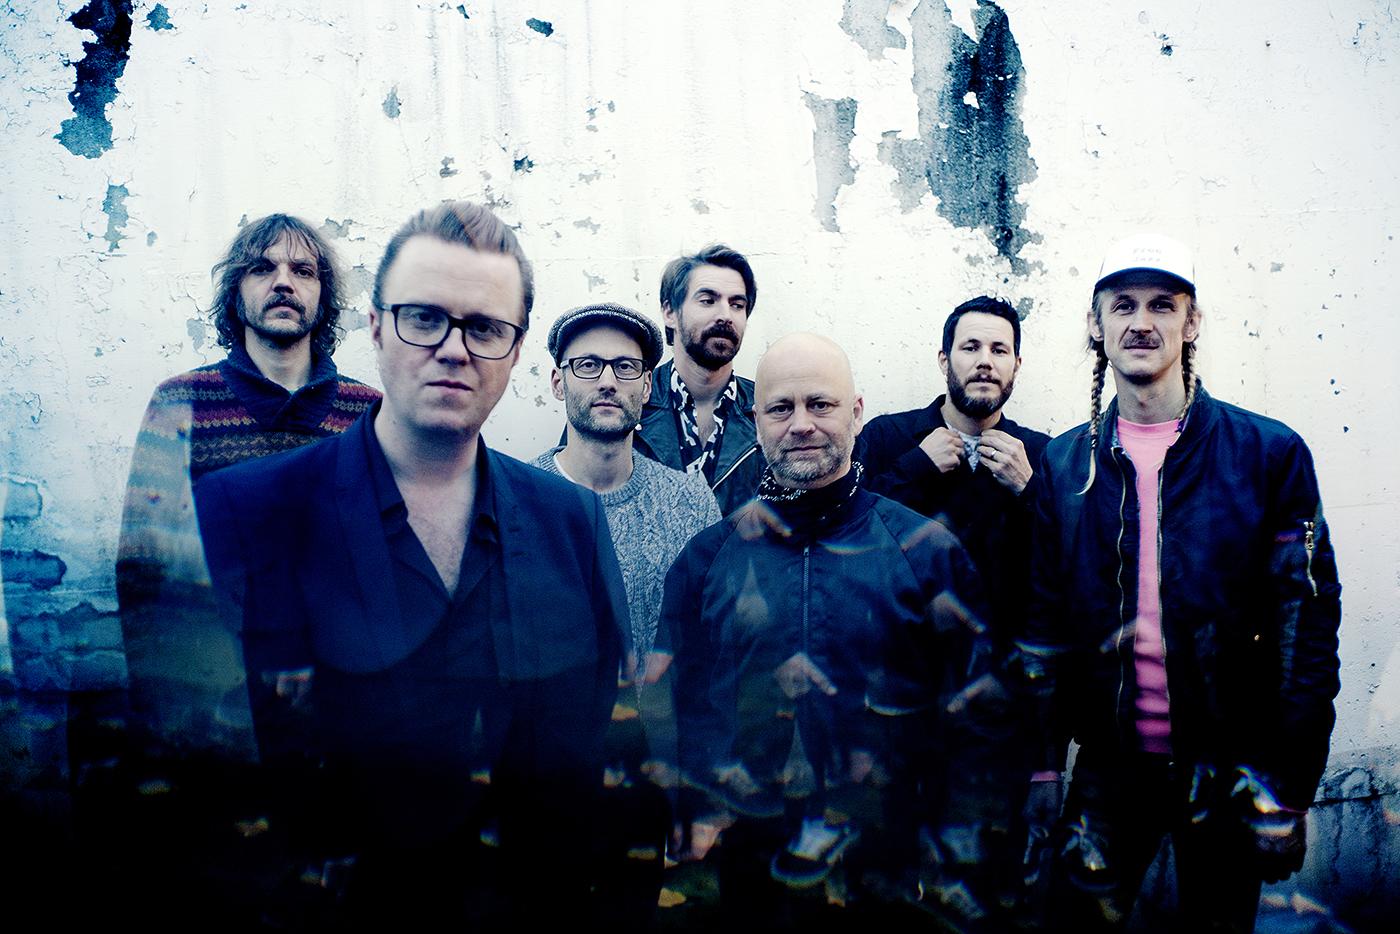 Ola Kvernberg revient le brillant concept album Steamdome II - The Hypogean